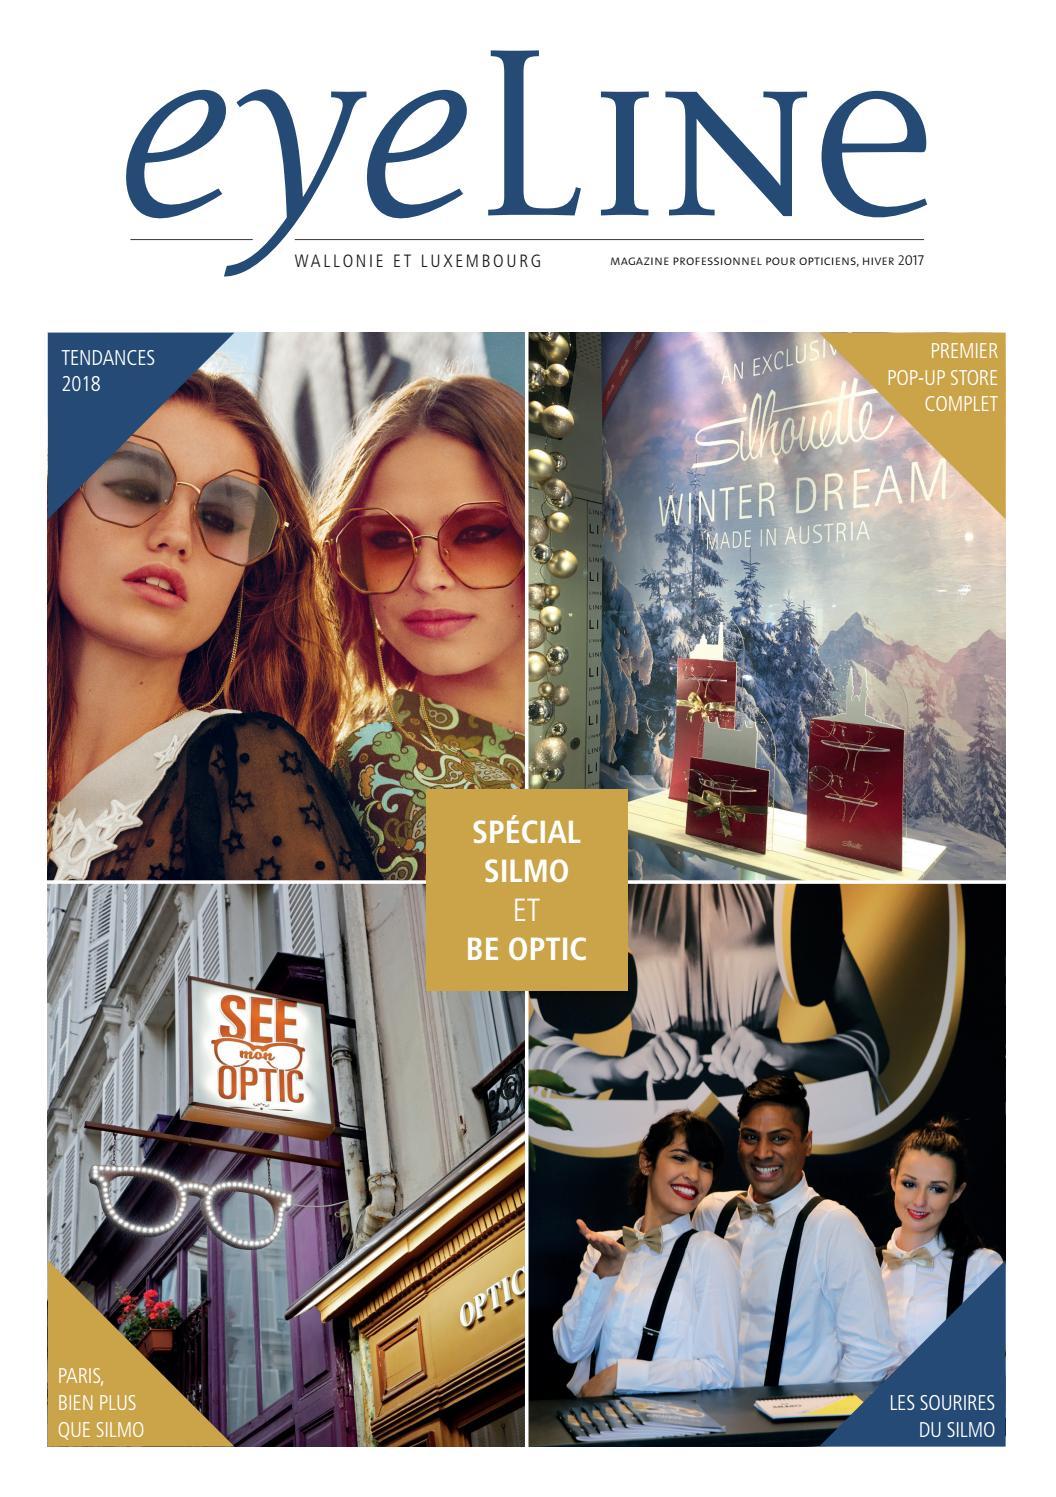 Eyeline Magazine Wallonie et Luxembourg 12-2017 by LT Media - issuu ec8fc6441cf6